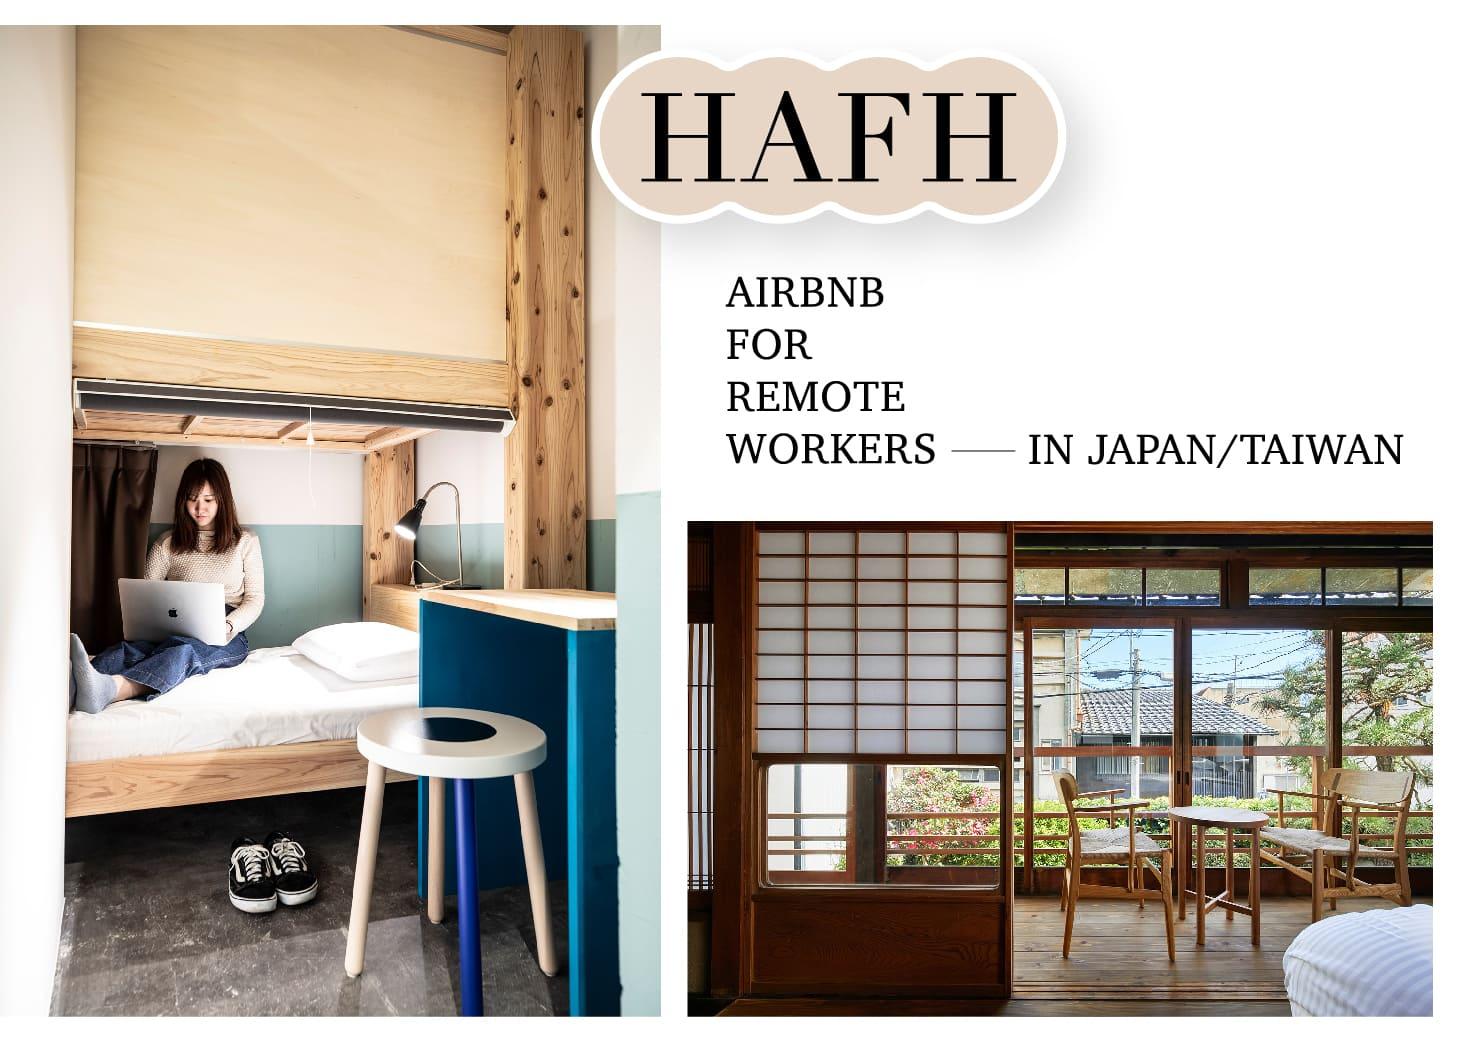 「Home to Home」通勤/日本HafH 「遠距工作者のAirbnb」進駐台灣!一泊二食三享受